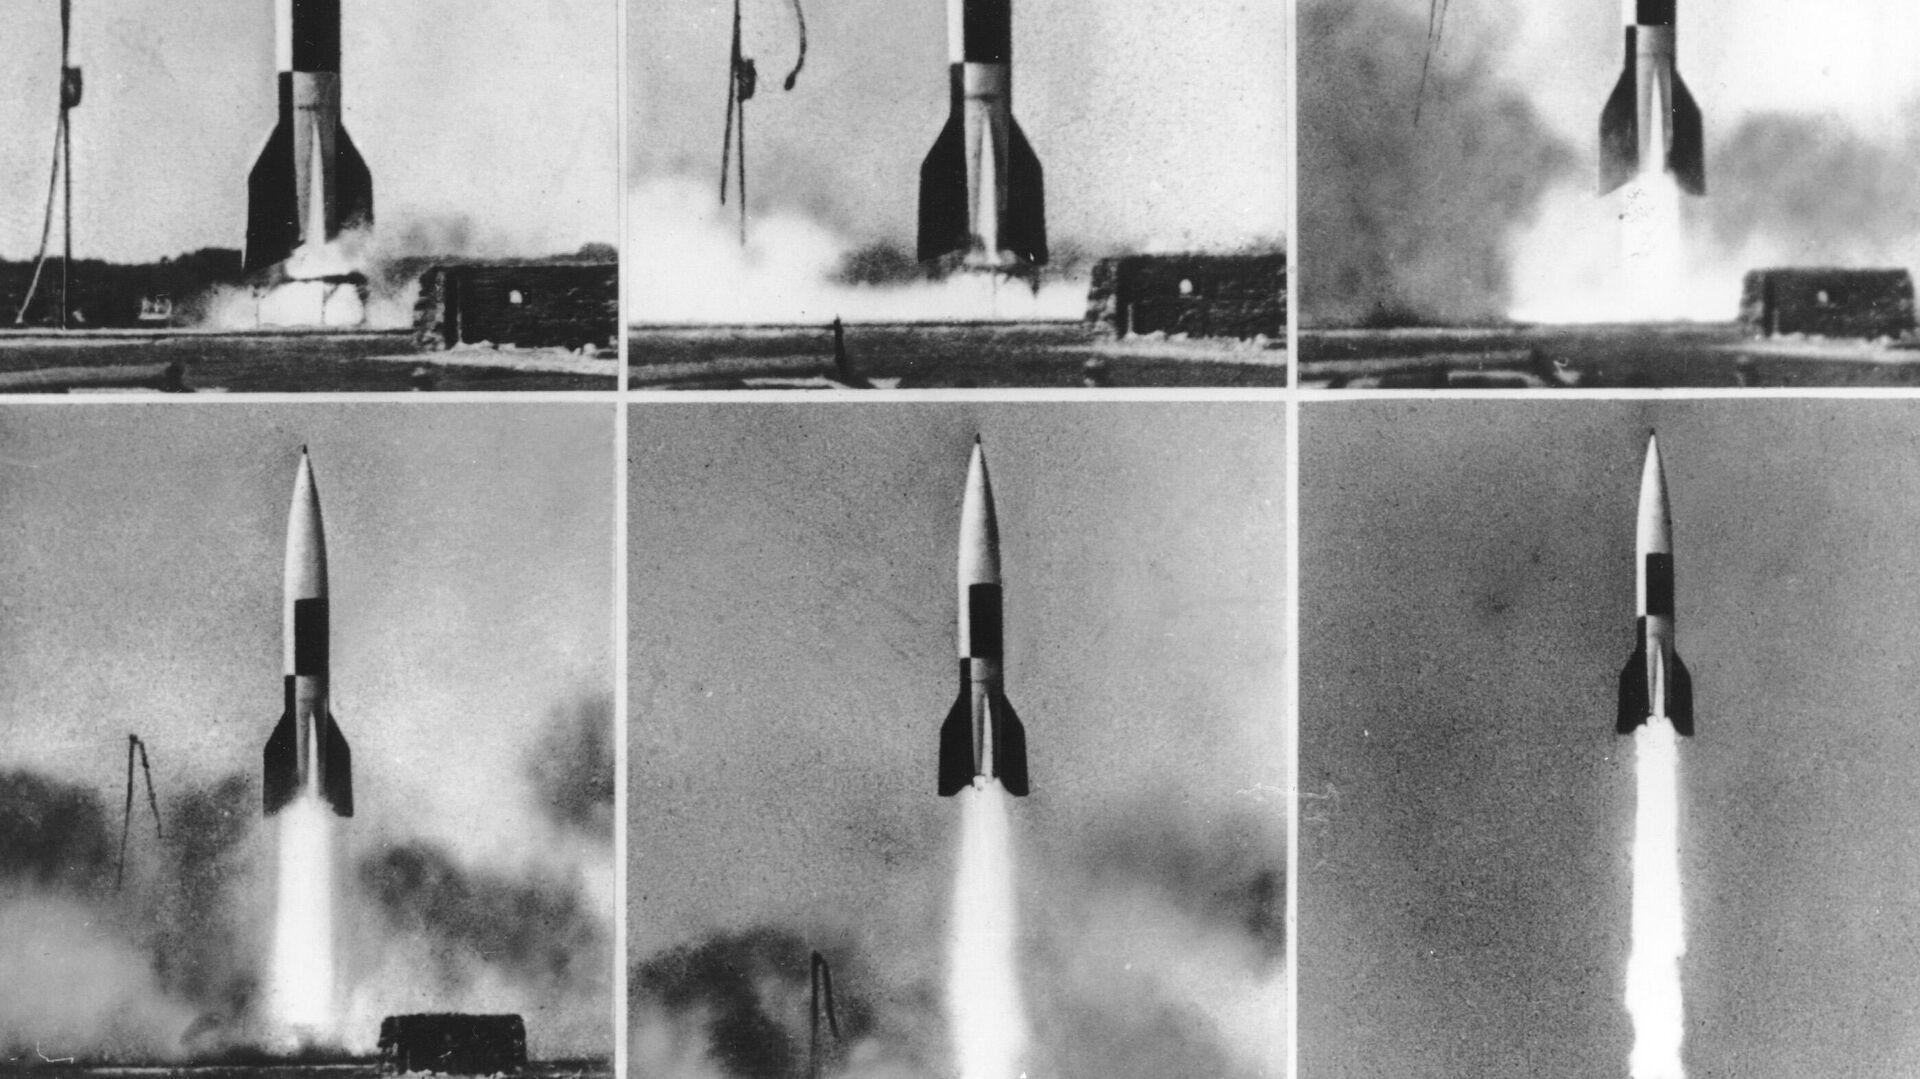 Misil V-2 producido por la Alemania nazi - Sputnik Mundo, 1920, 23.03.2021